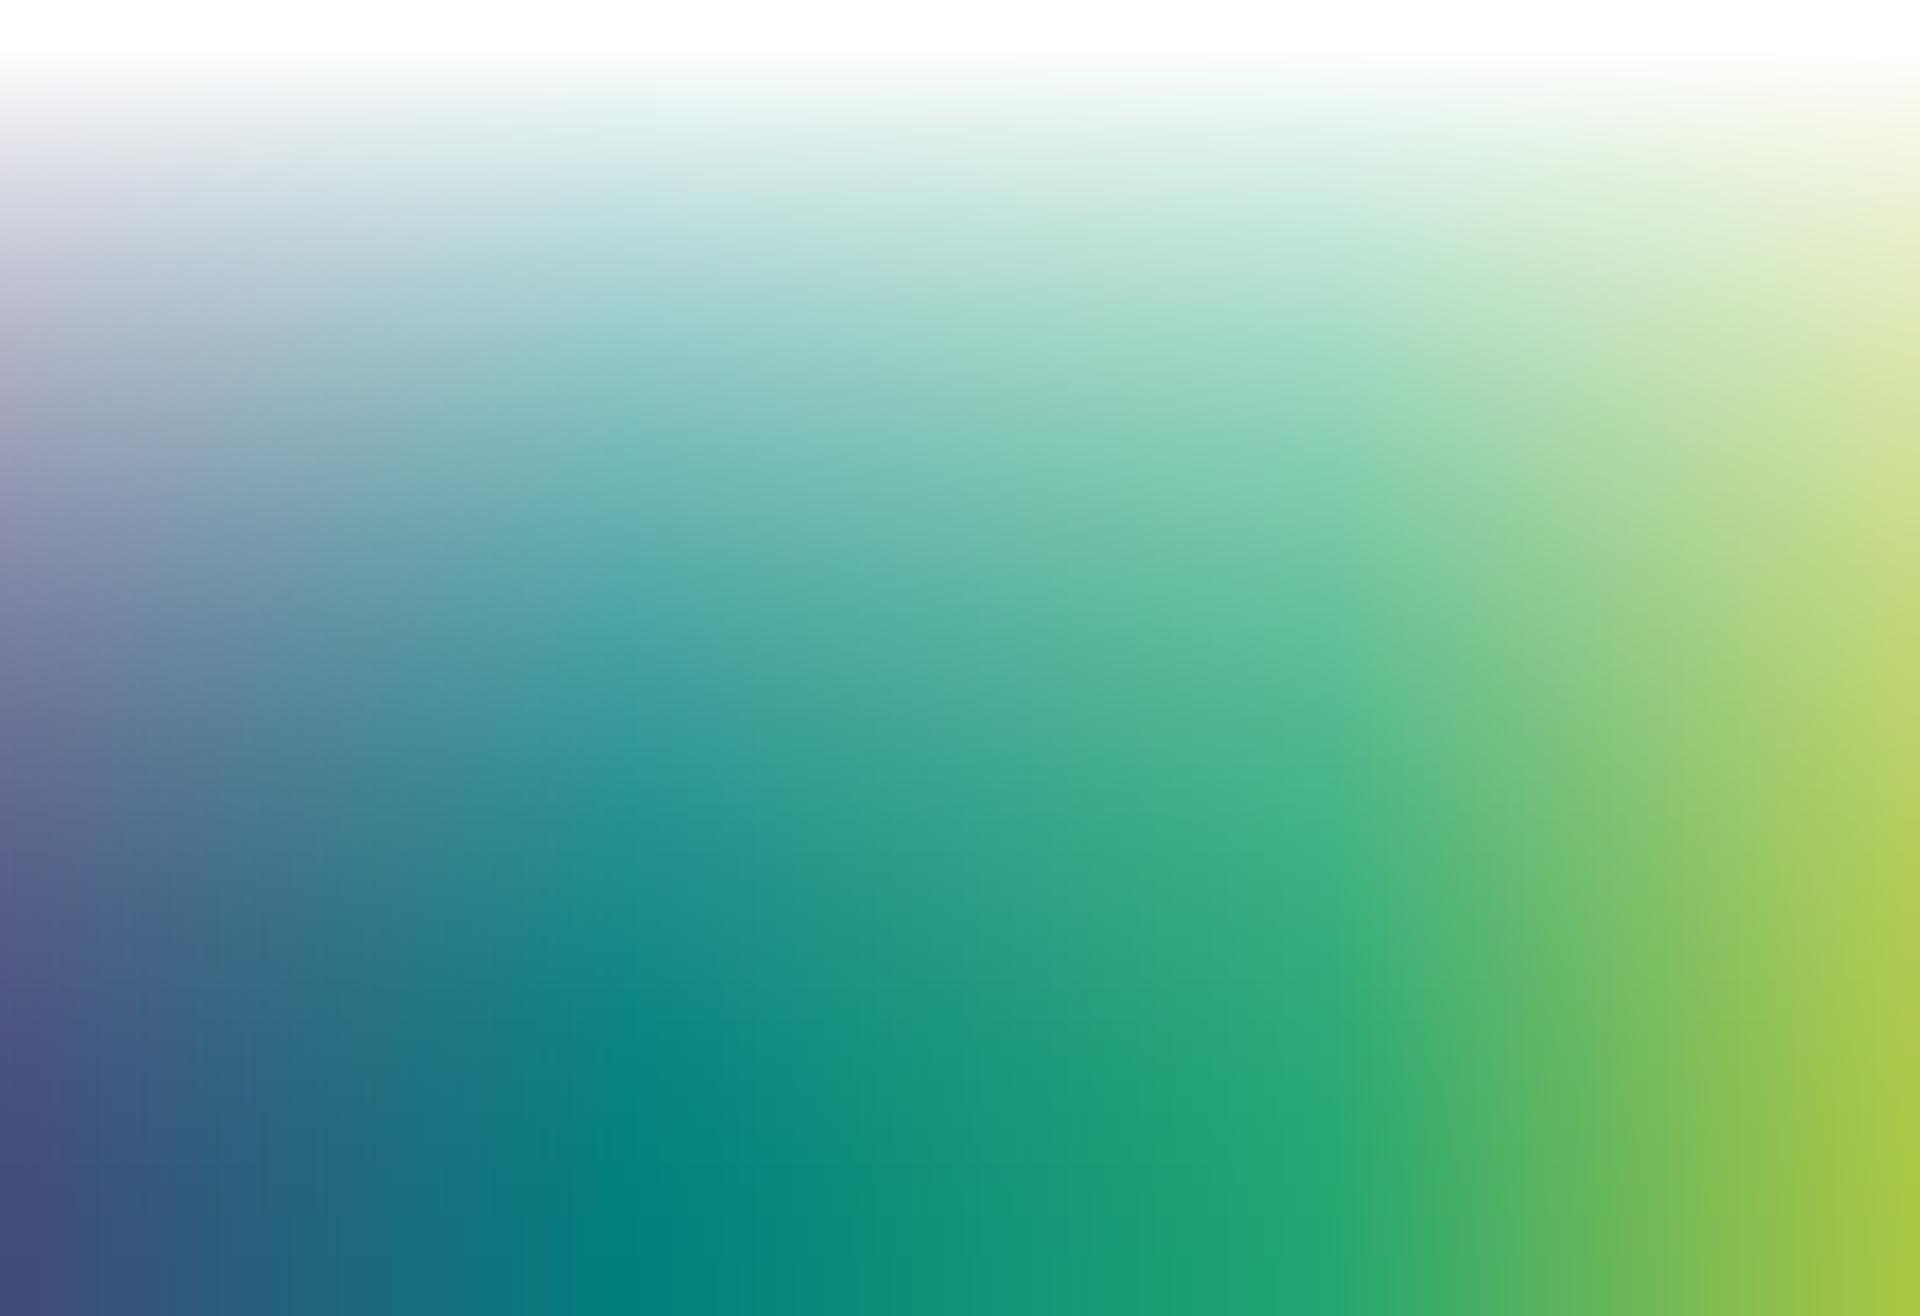 SiConsiulting_Website_Elements_Gradient